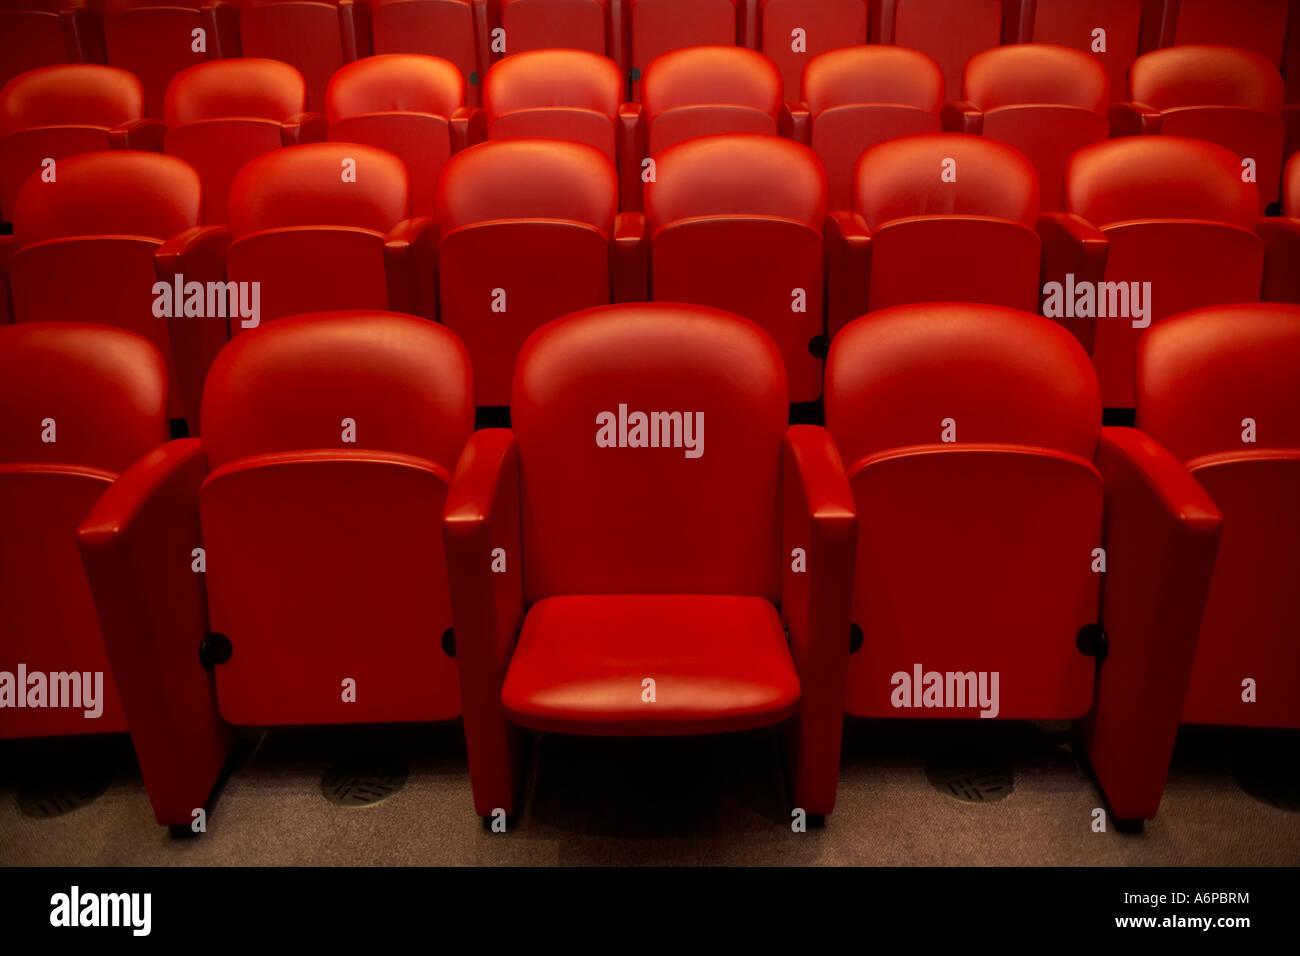 Theatre seats stock photos theatre seats stock images alamy red theatre seats stock image freerunsca Gallery